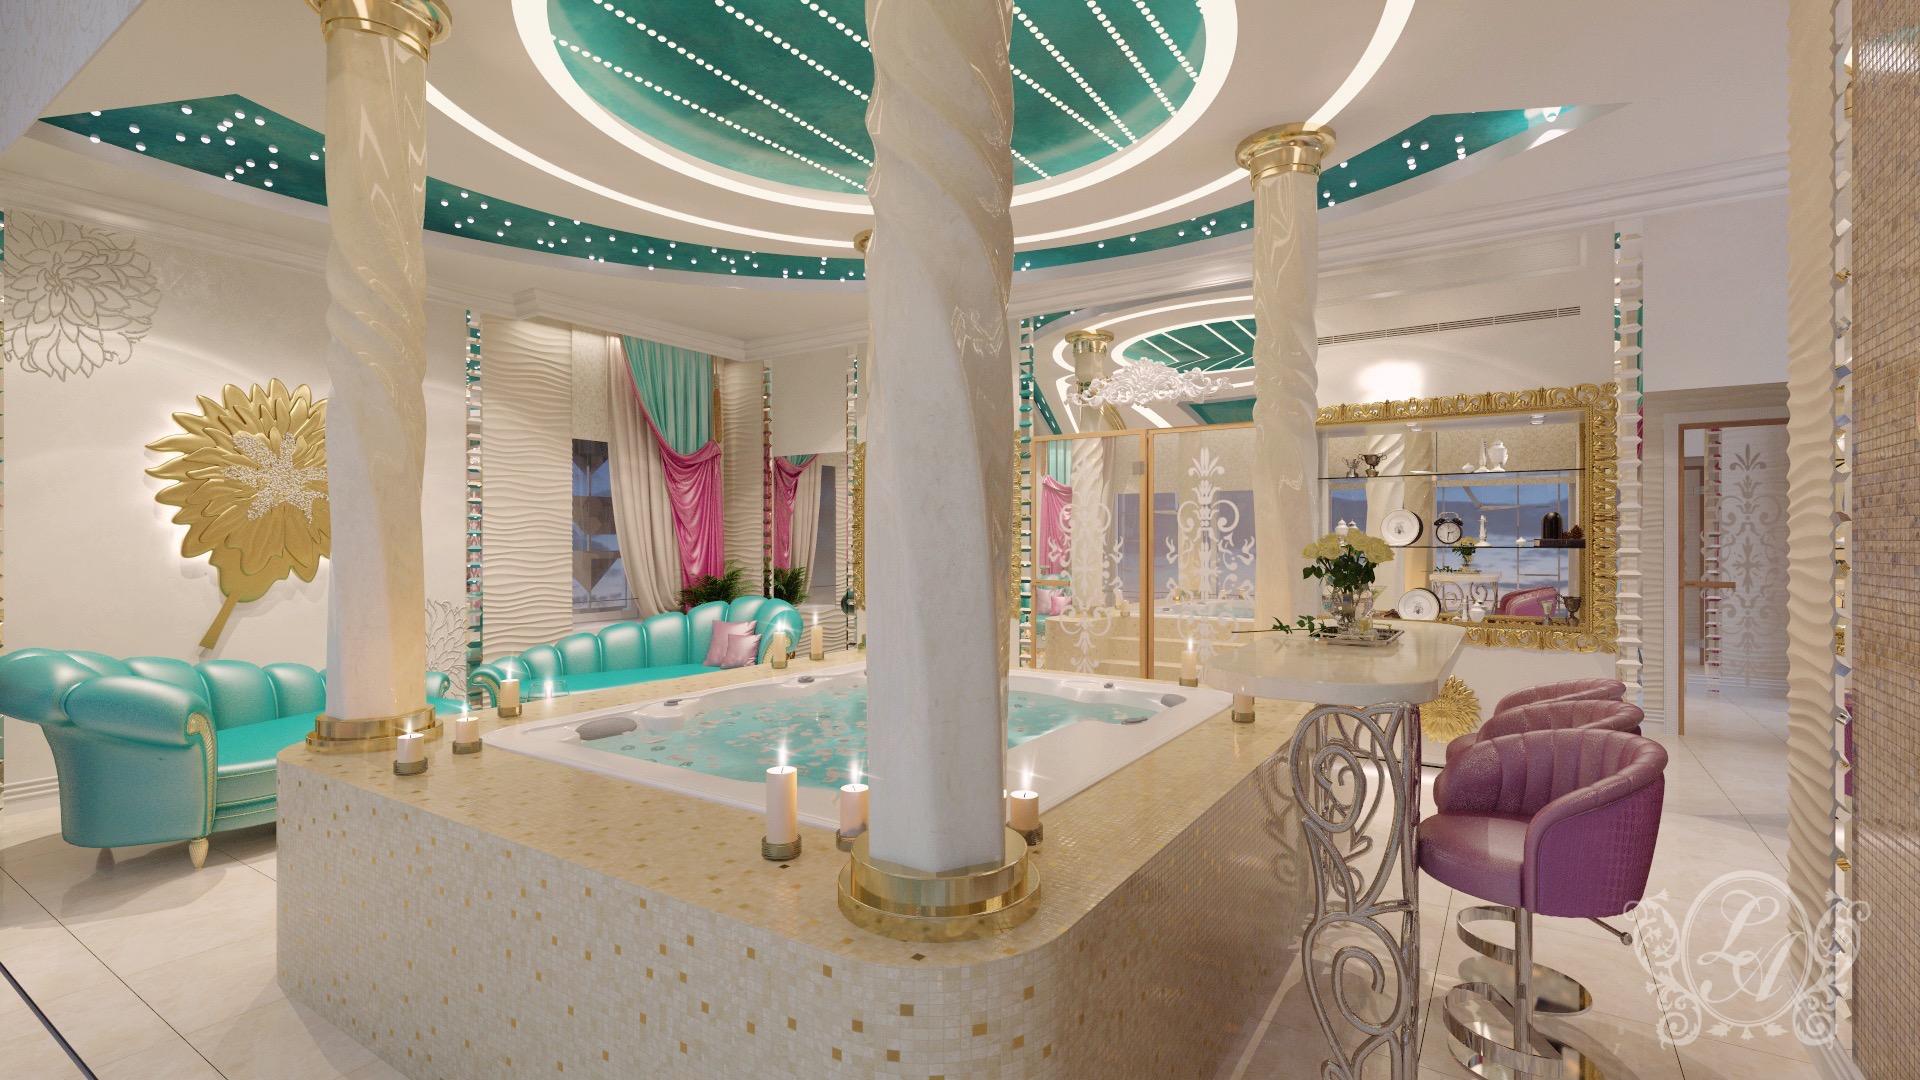 luxurious_private_spa_04.jpg